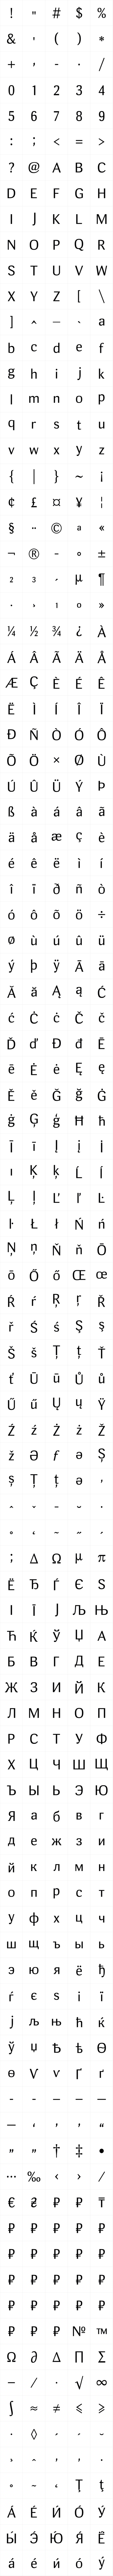 Deca Sans